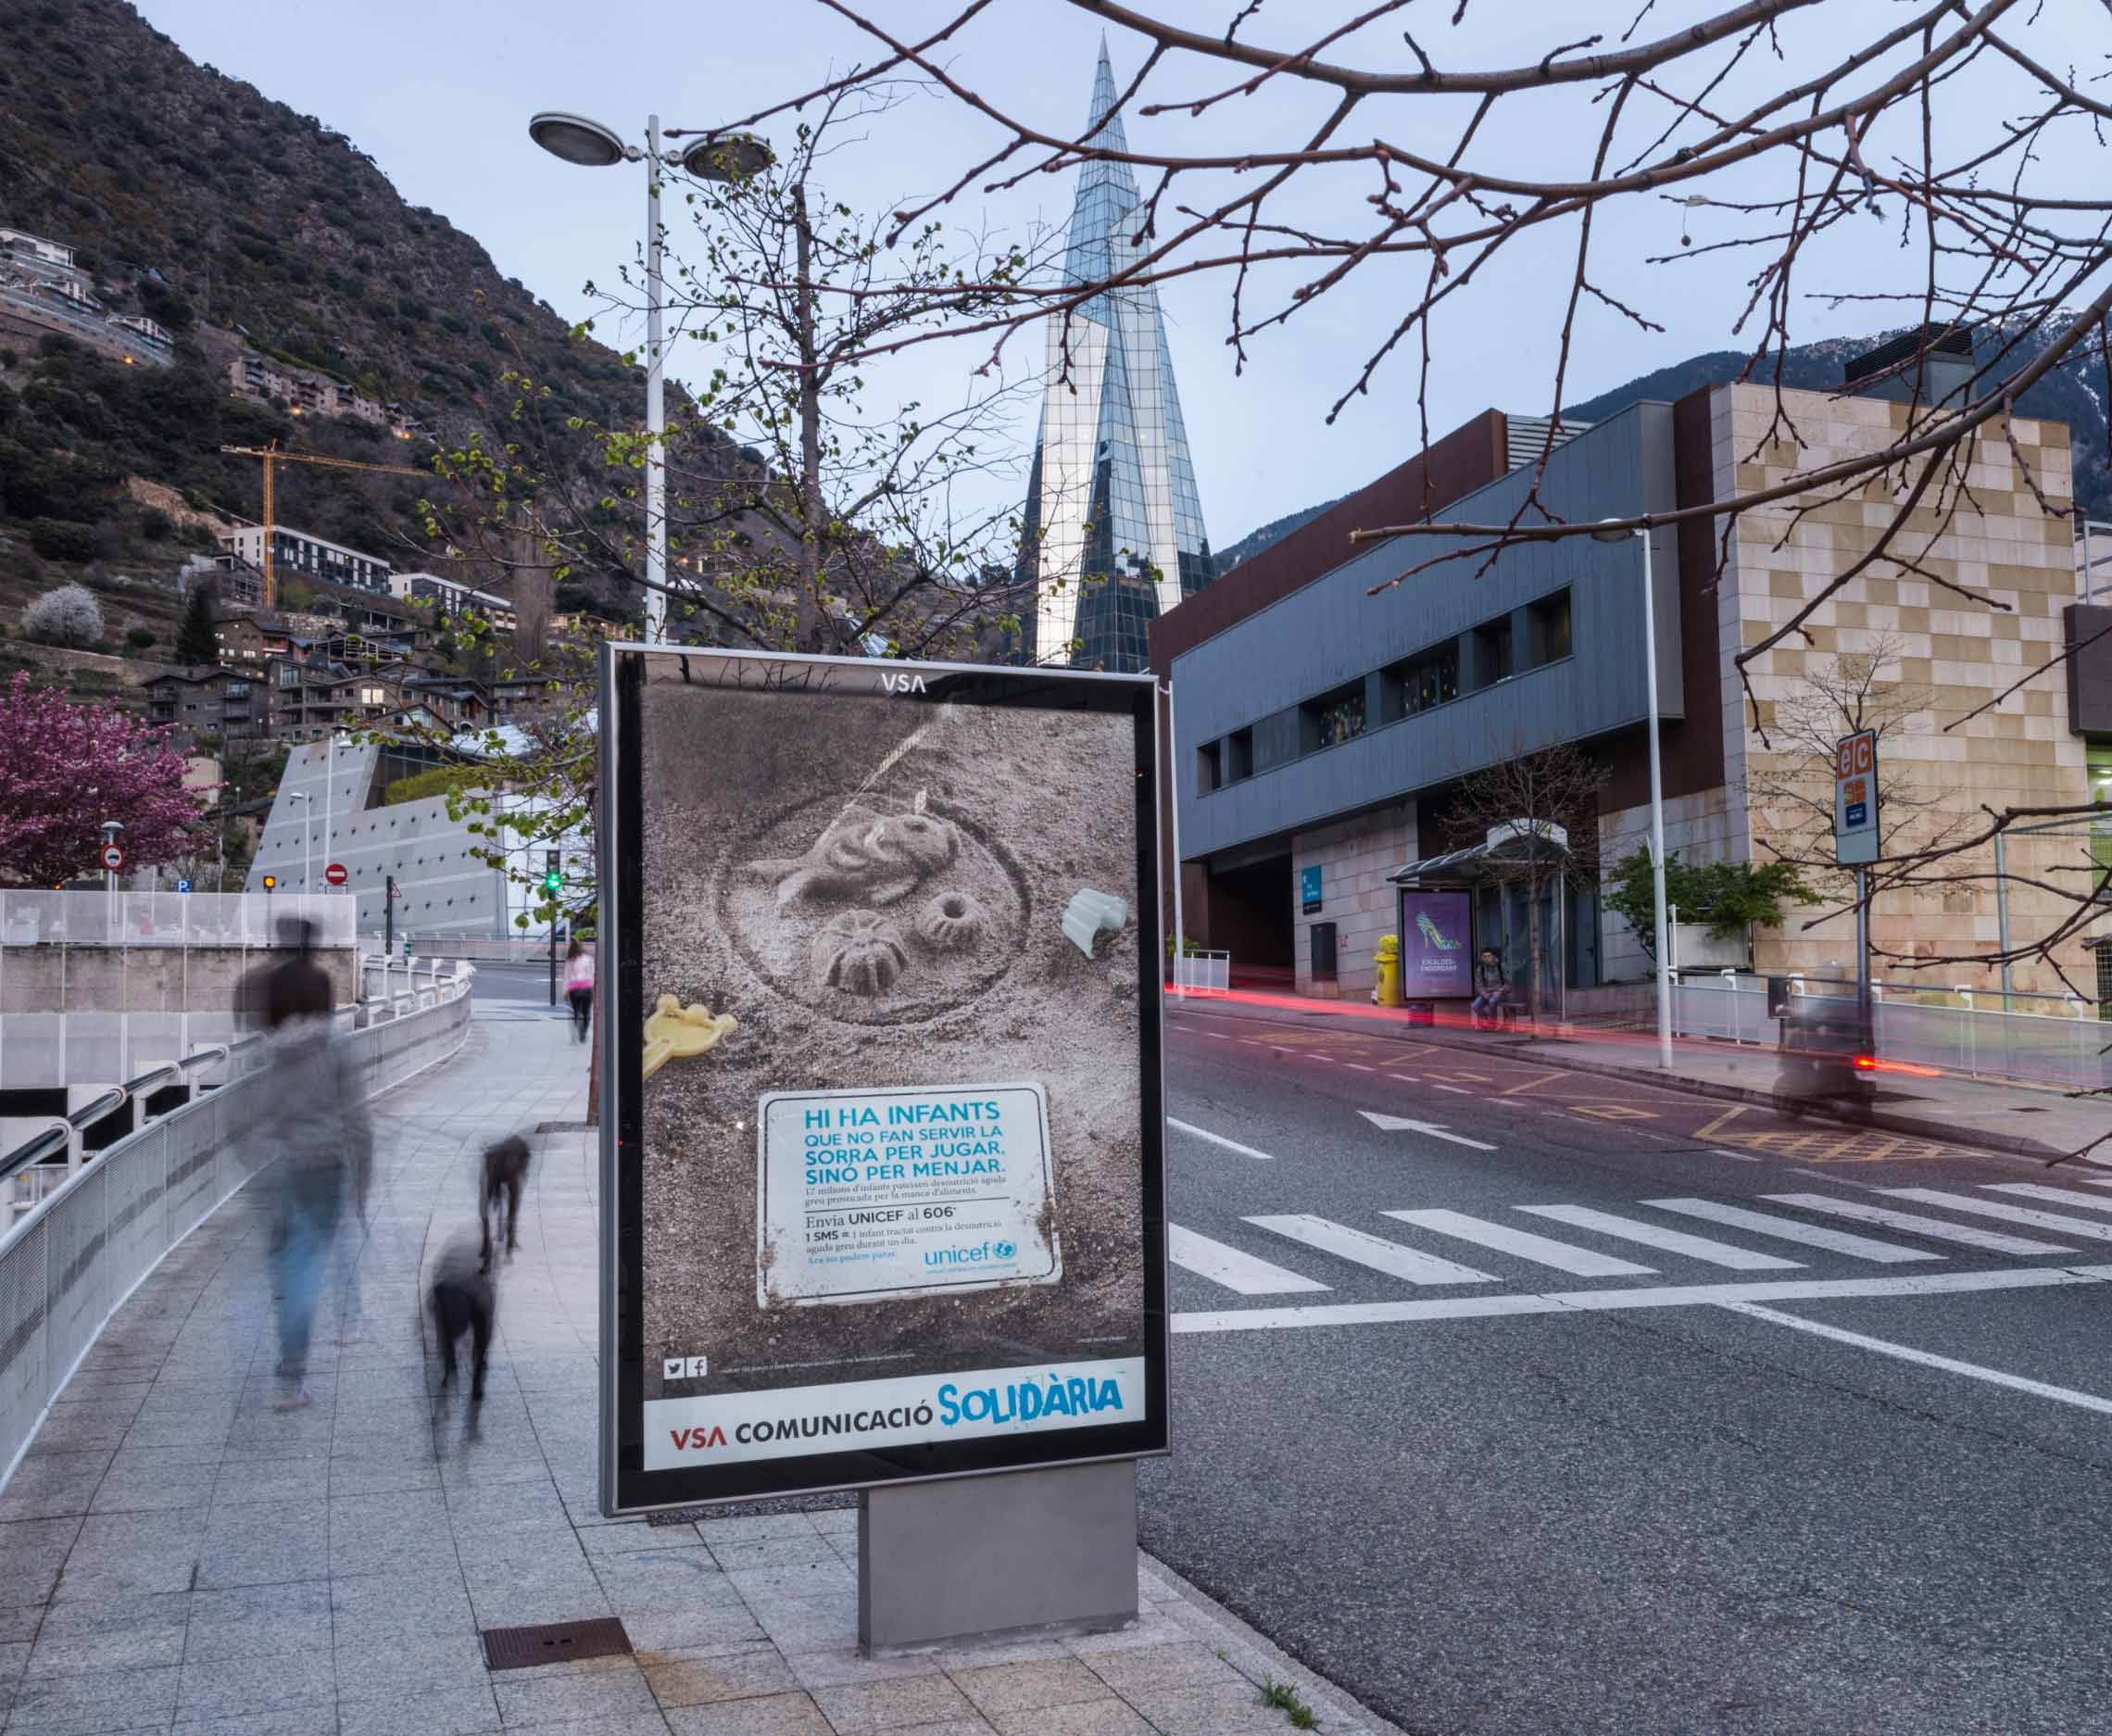 mobiliario-urbano-oppi-publicidad-exterior-unicef-andorra-rsc-caldea-vsa-comunicacion